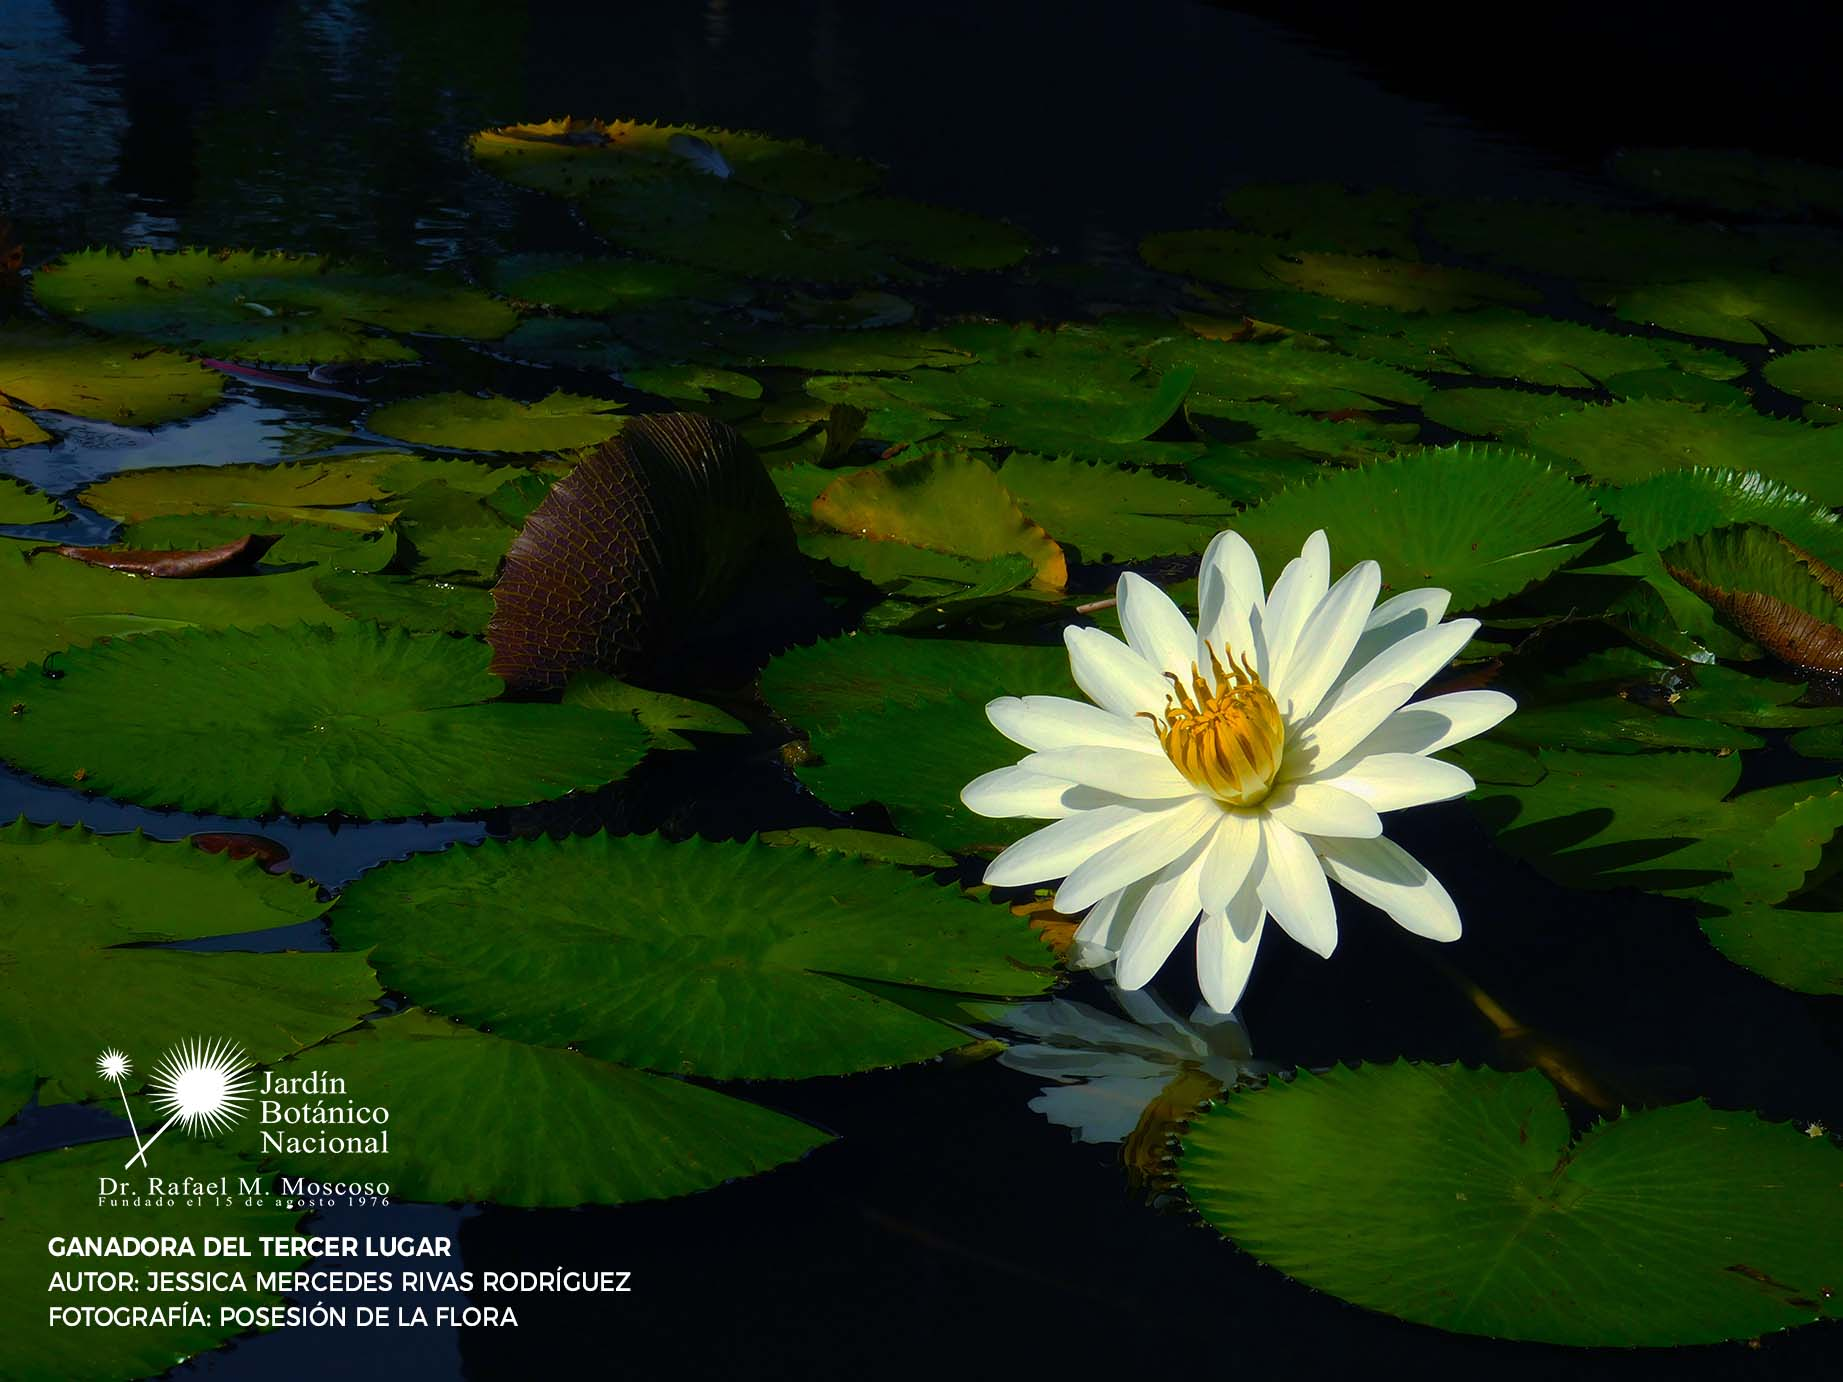 Jardín Botánico Nacional   JBN - Inicio